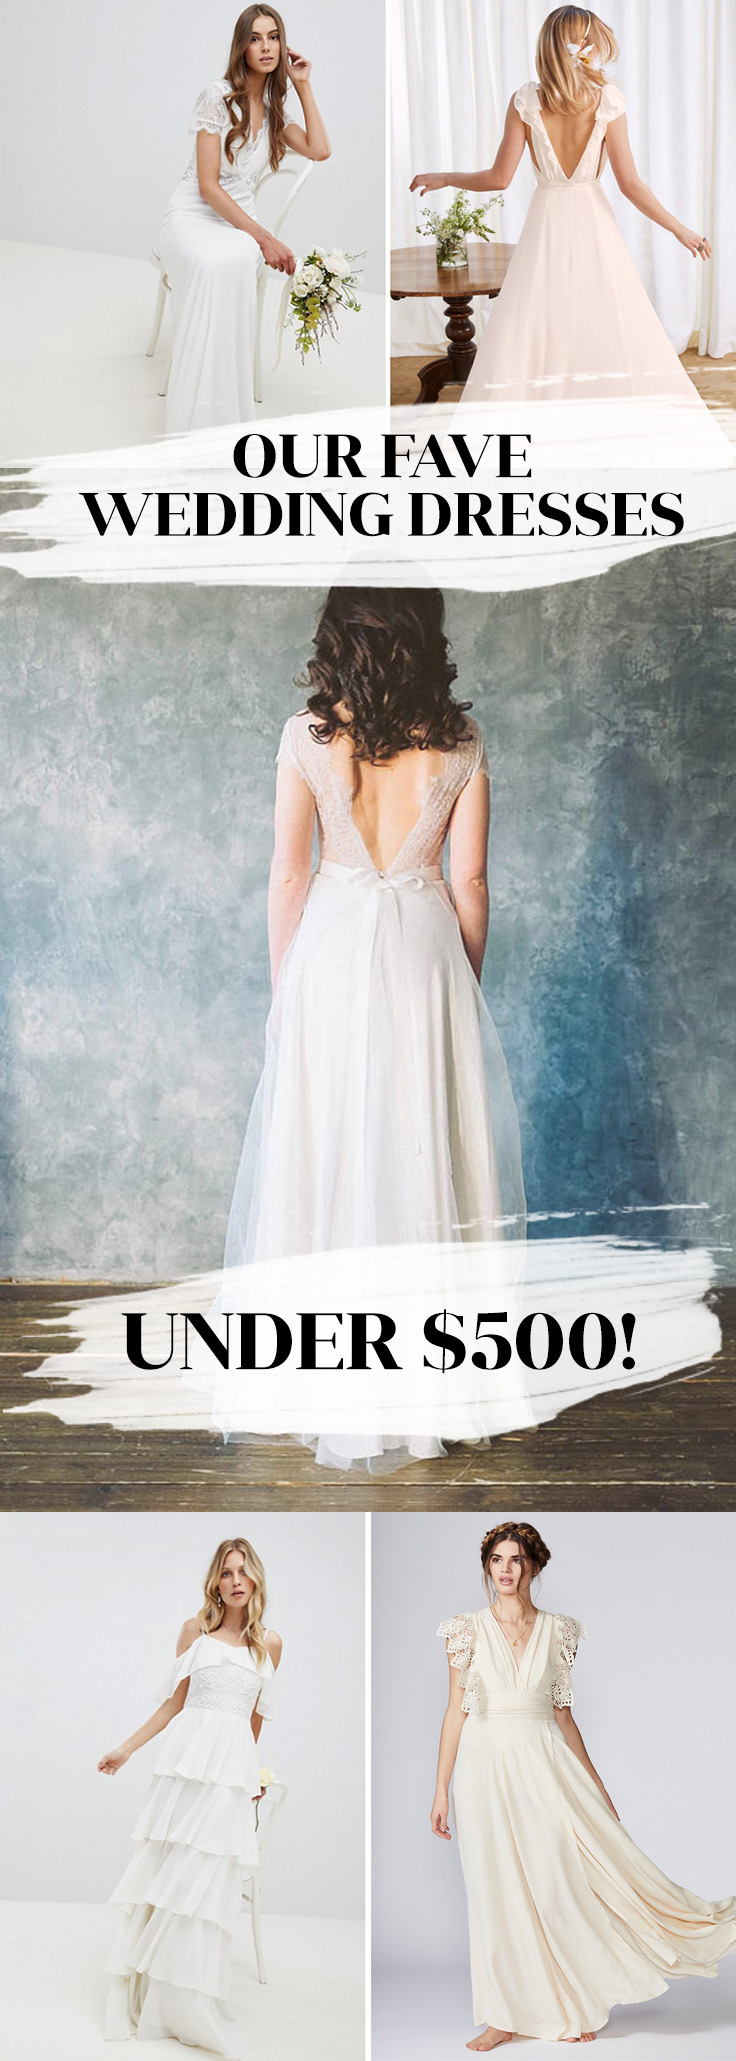 Fave Wedding Dress 2018